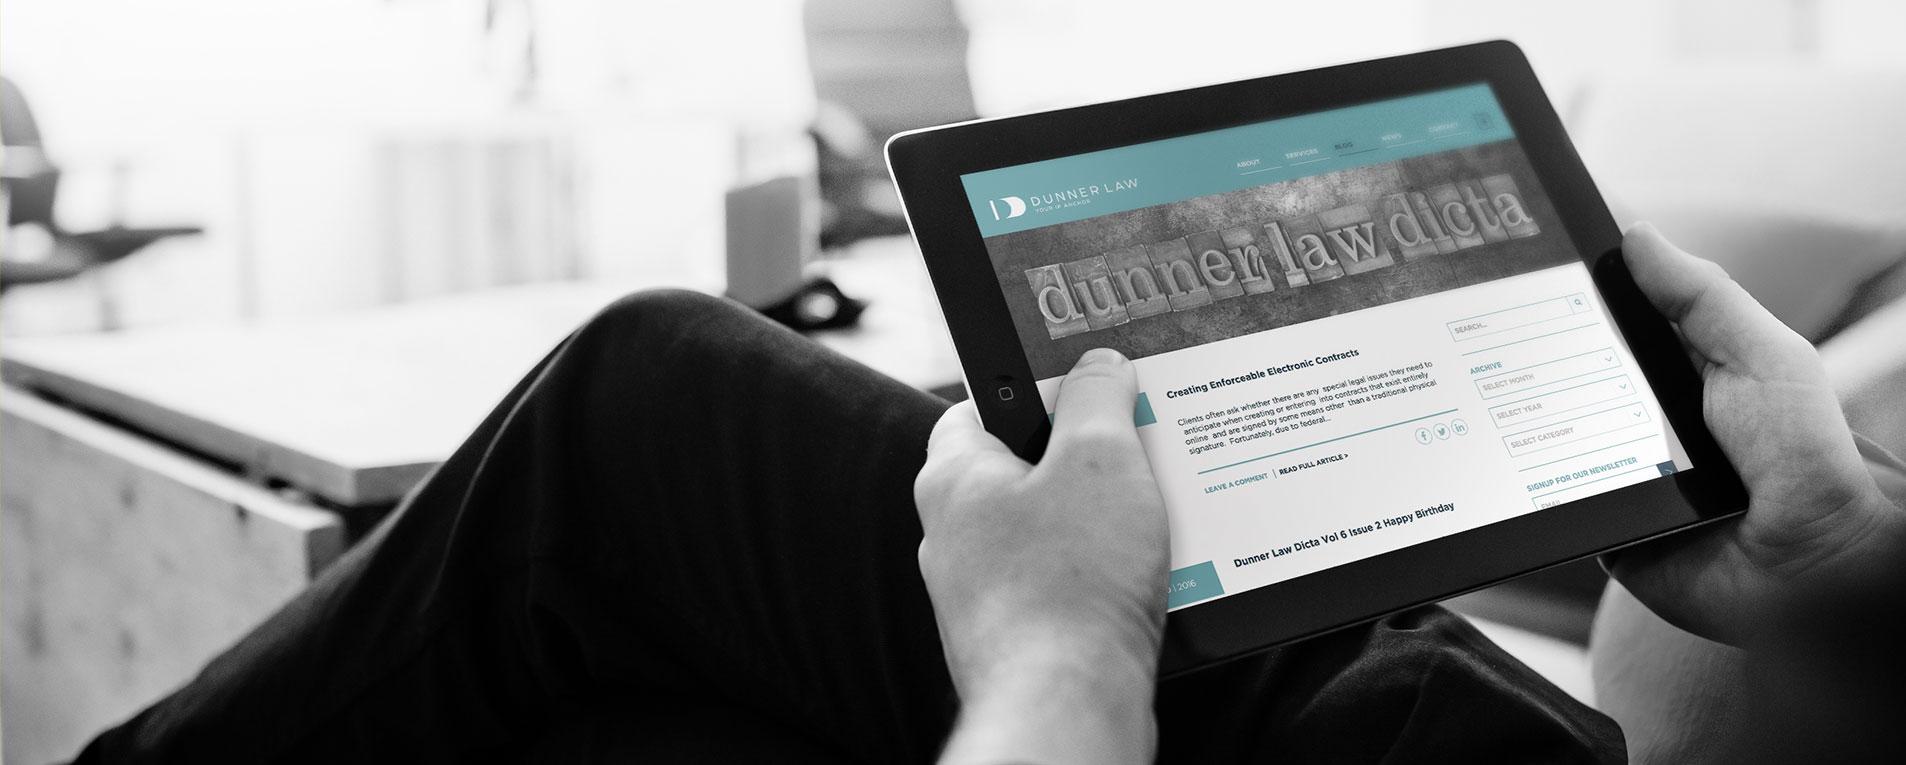 mobile website design for dunner law